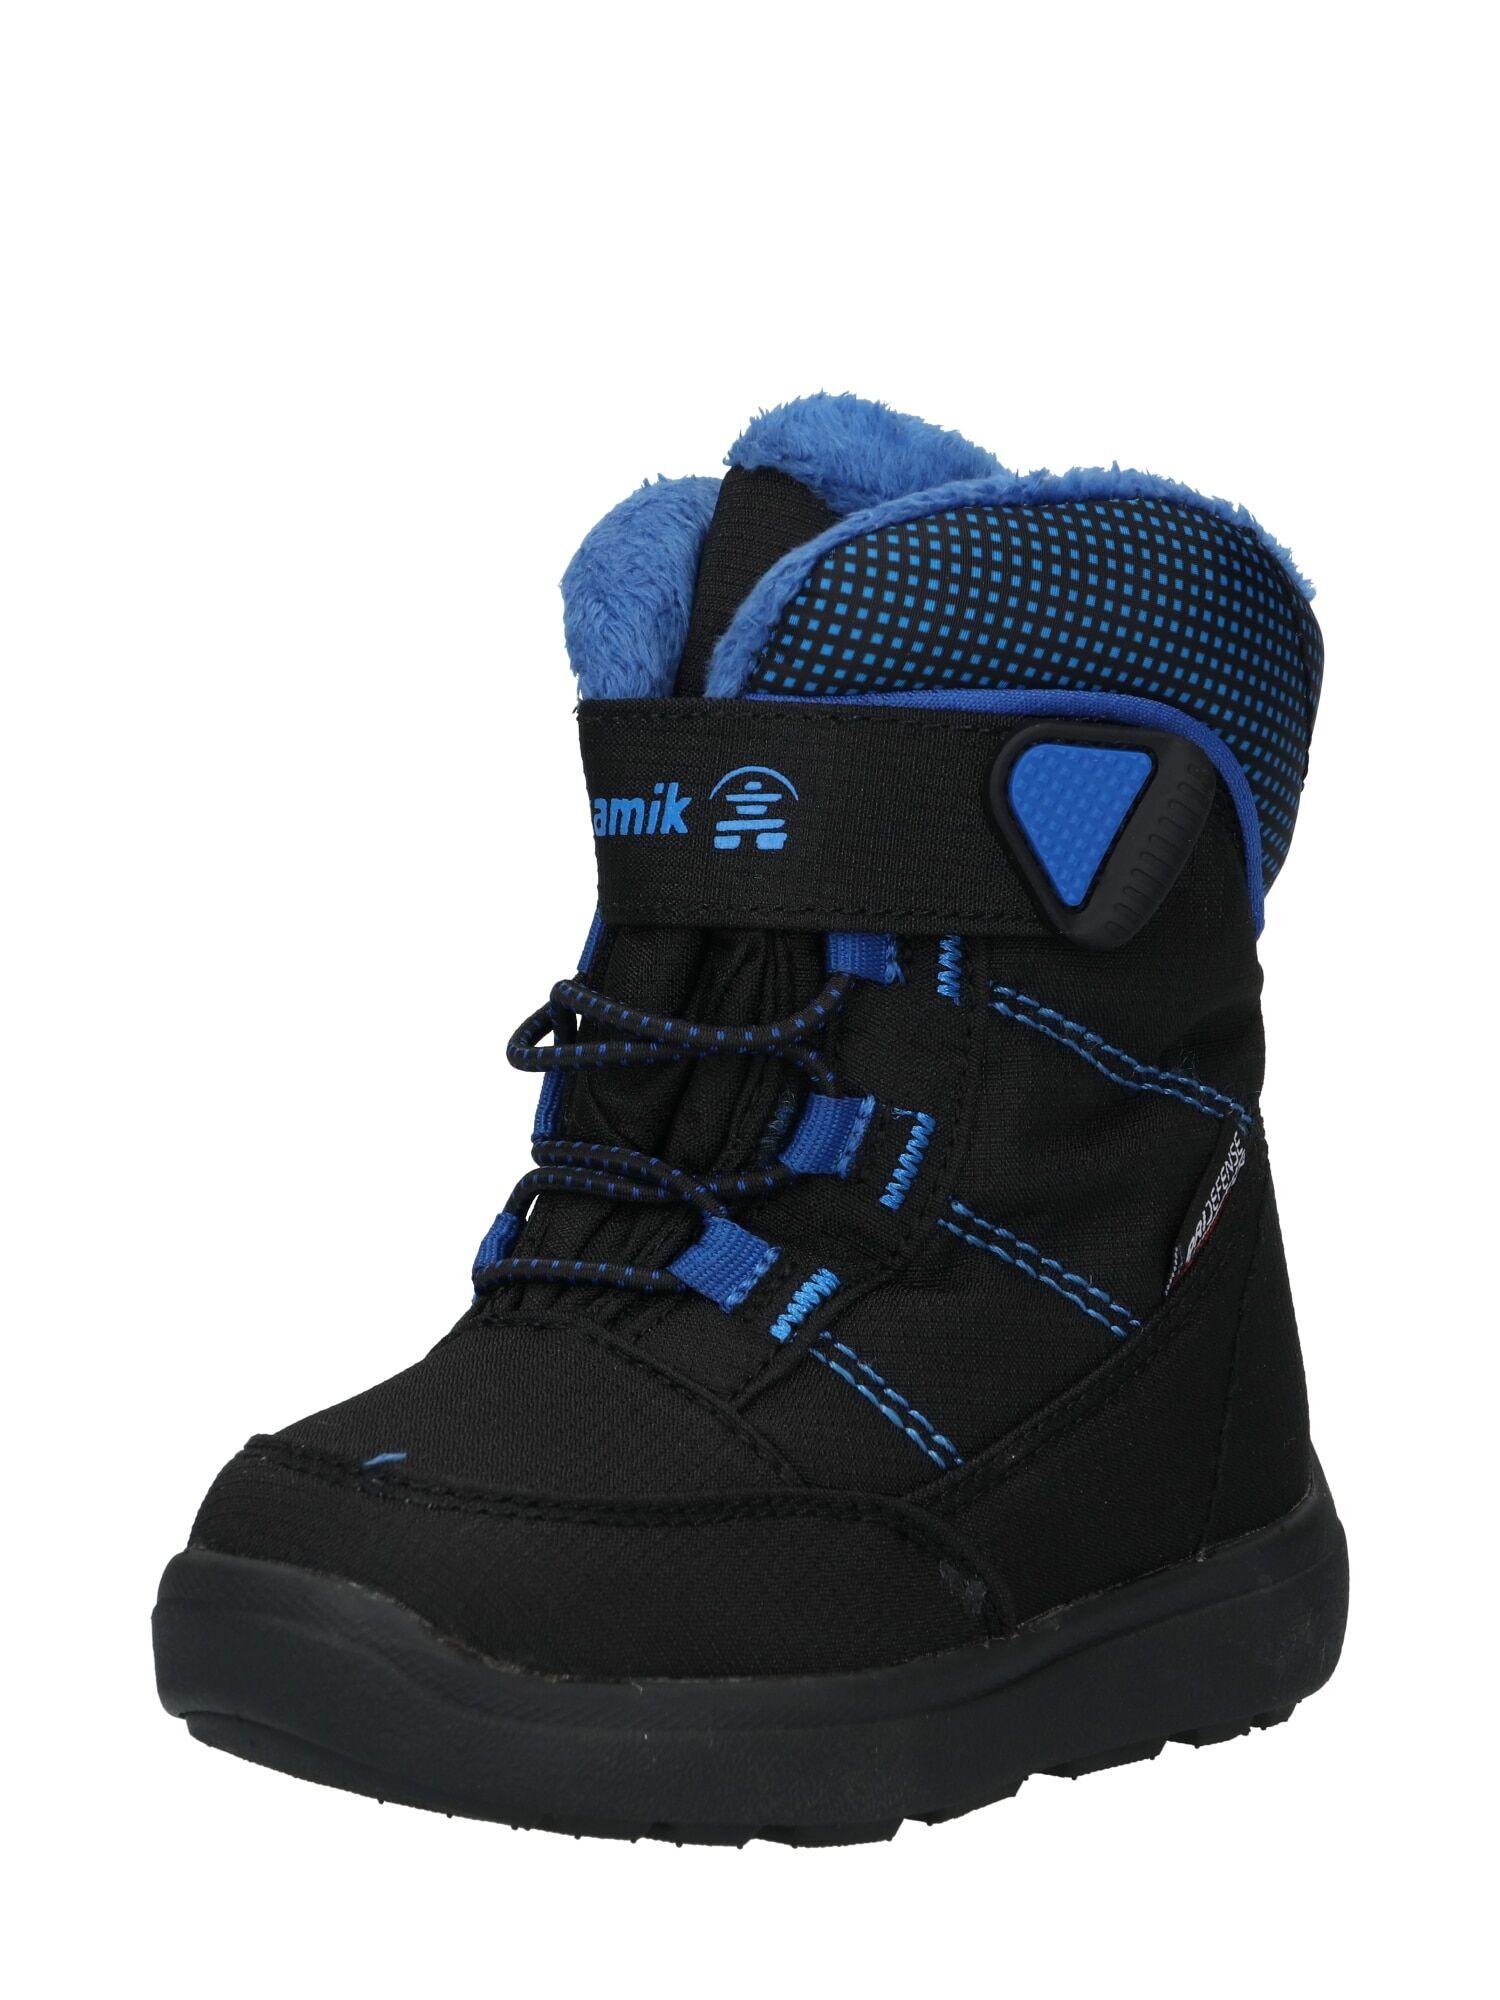 Kamik Boots 'Stance2' Blu, Nero